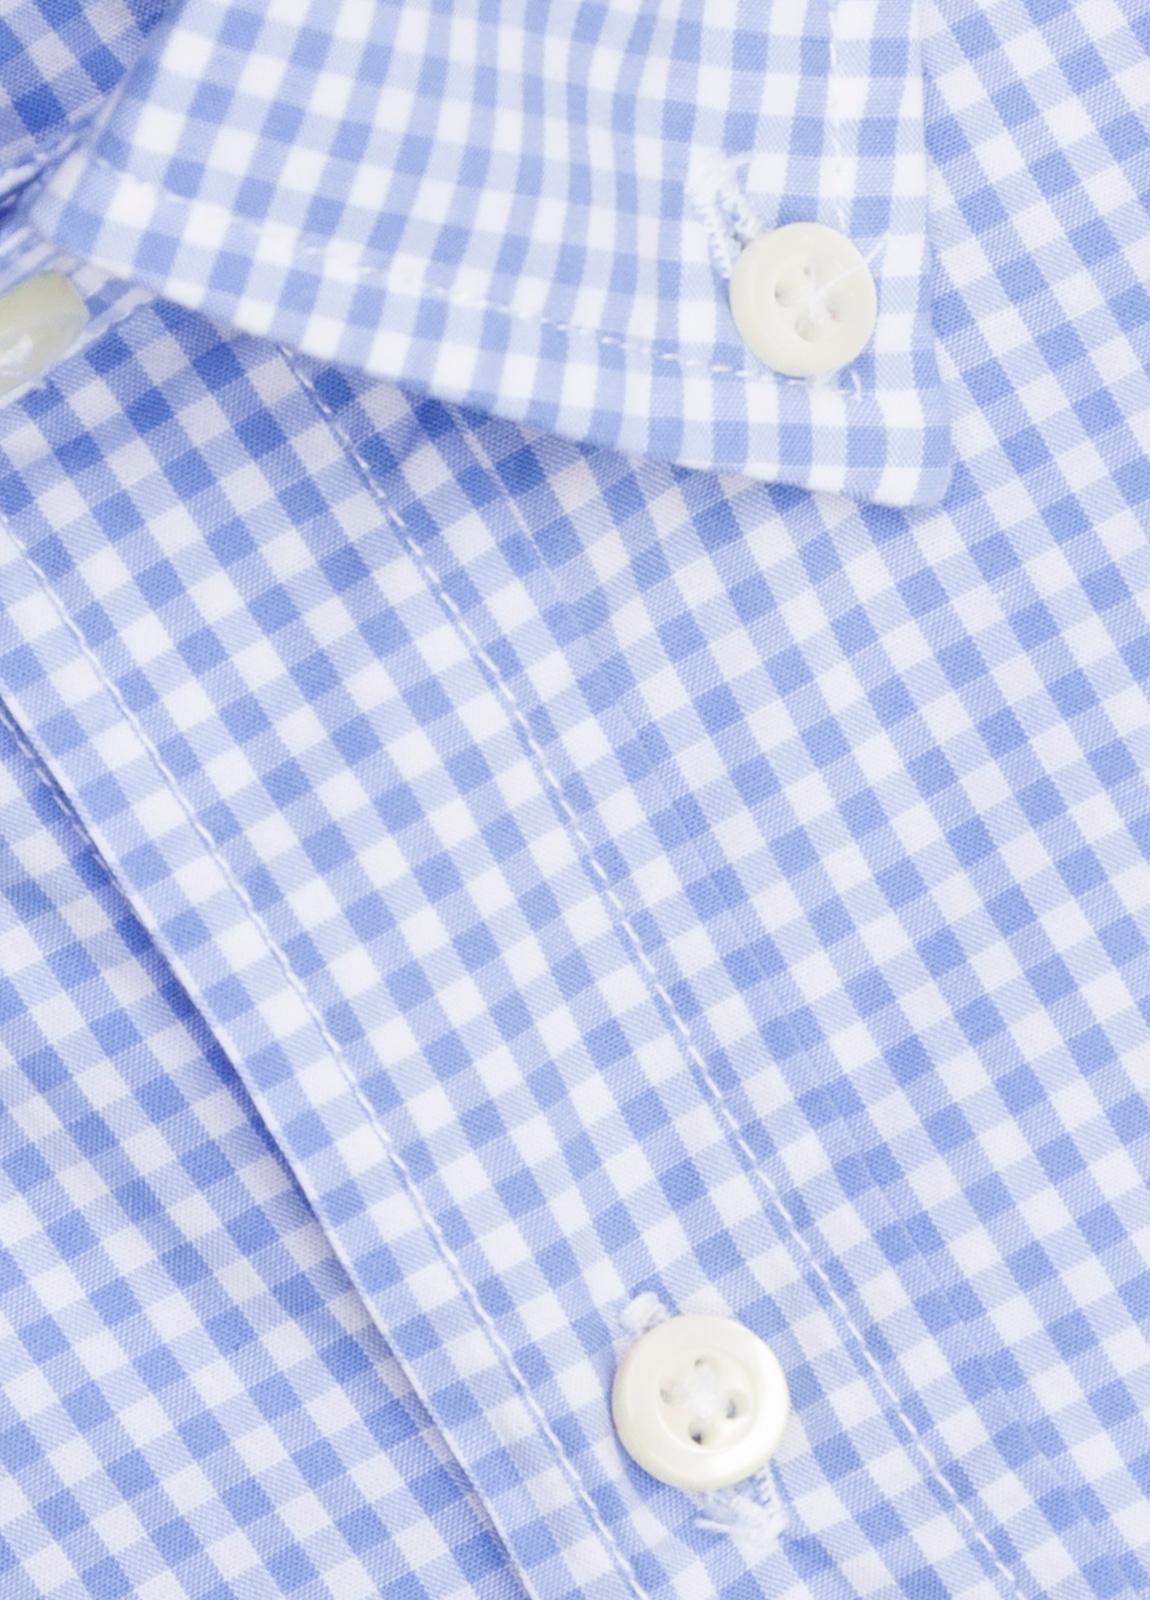 Camisa M/Corta sport FUREST COLECCIÓN Regular FIT vichy celeste - Ítem1